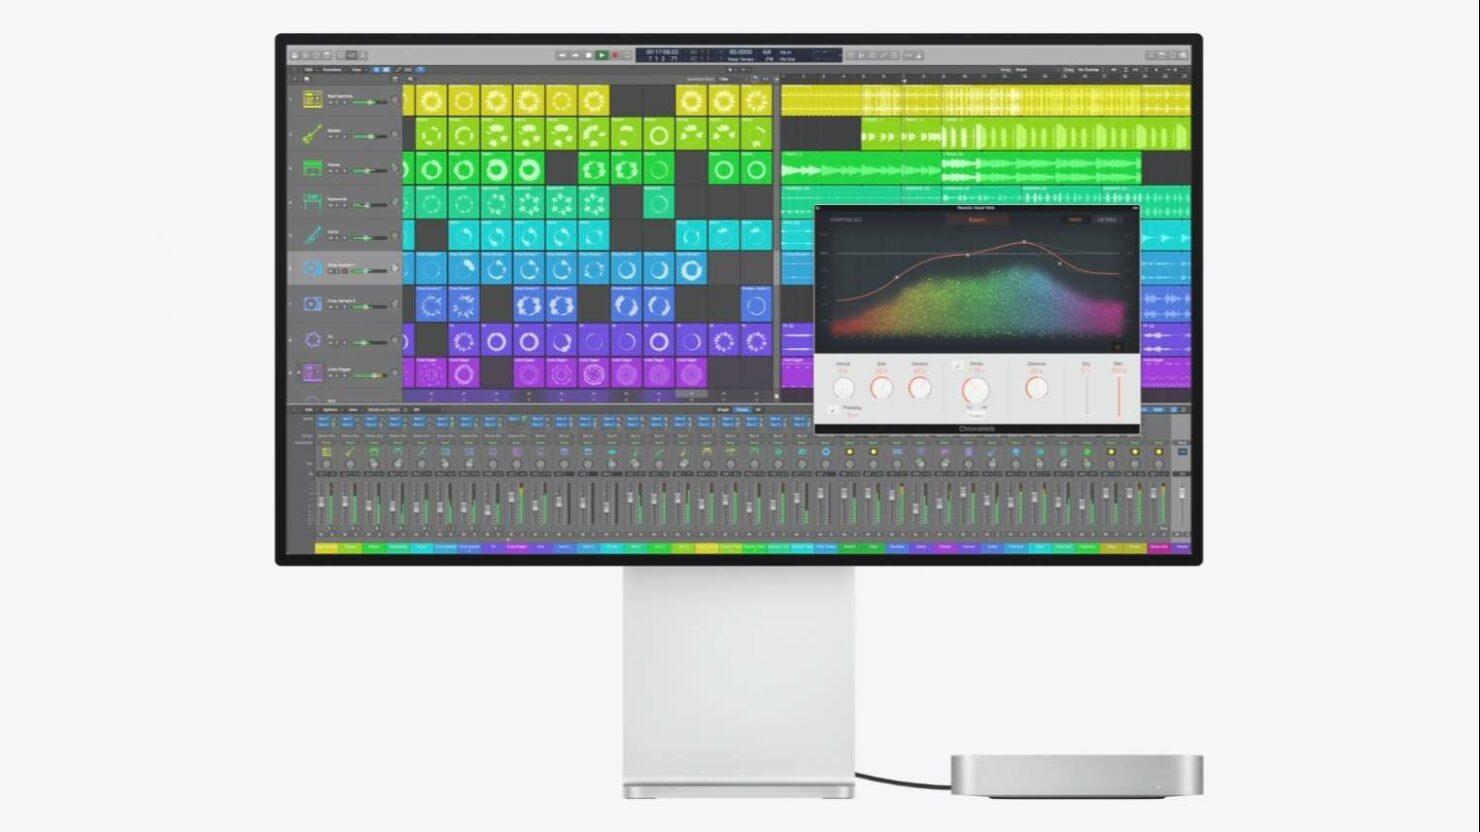 mac-mini-with-m1-chip-4